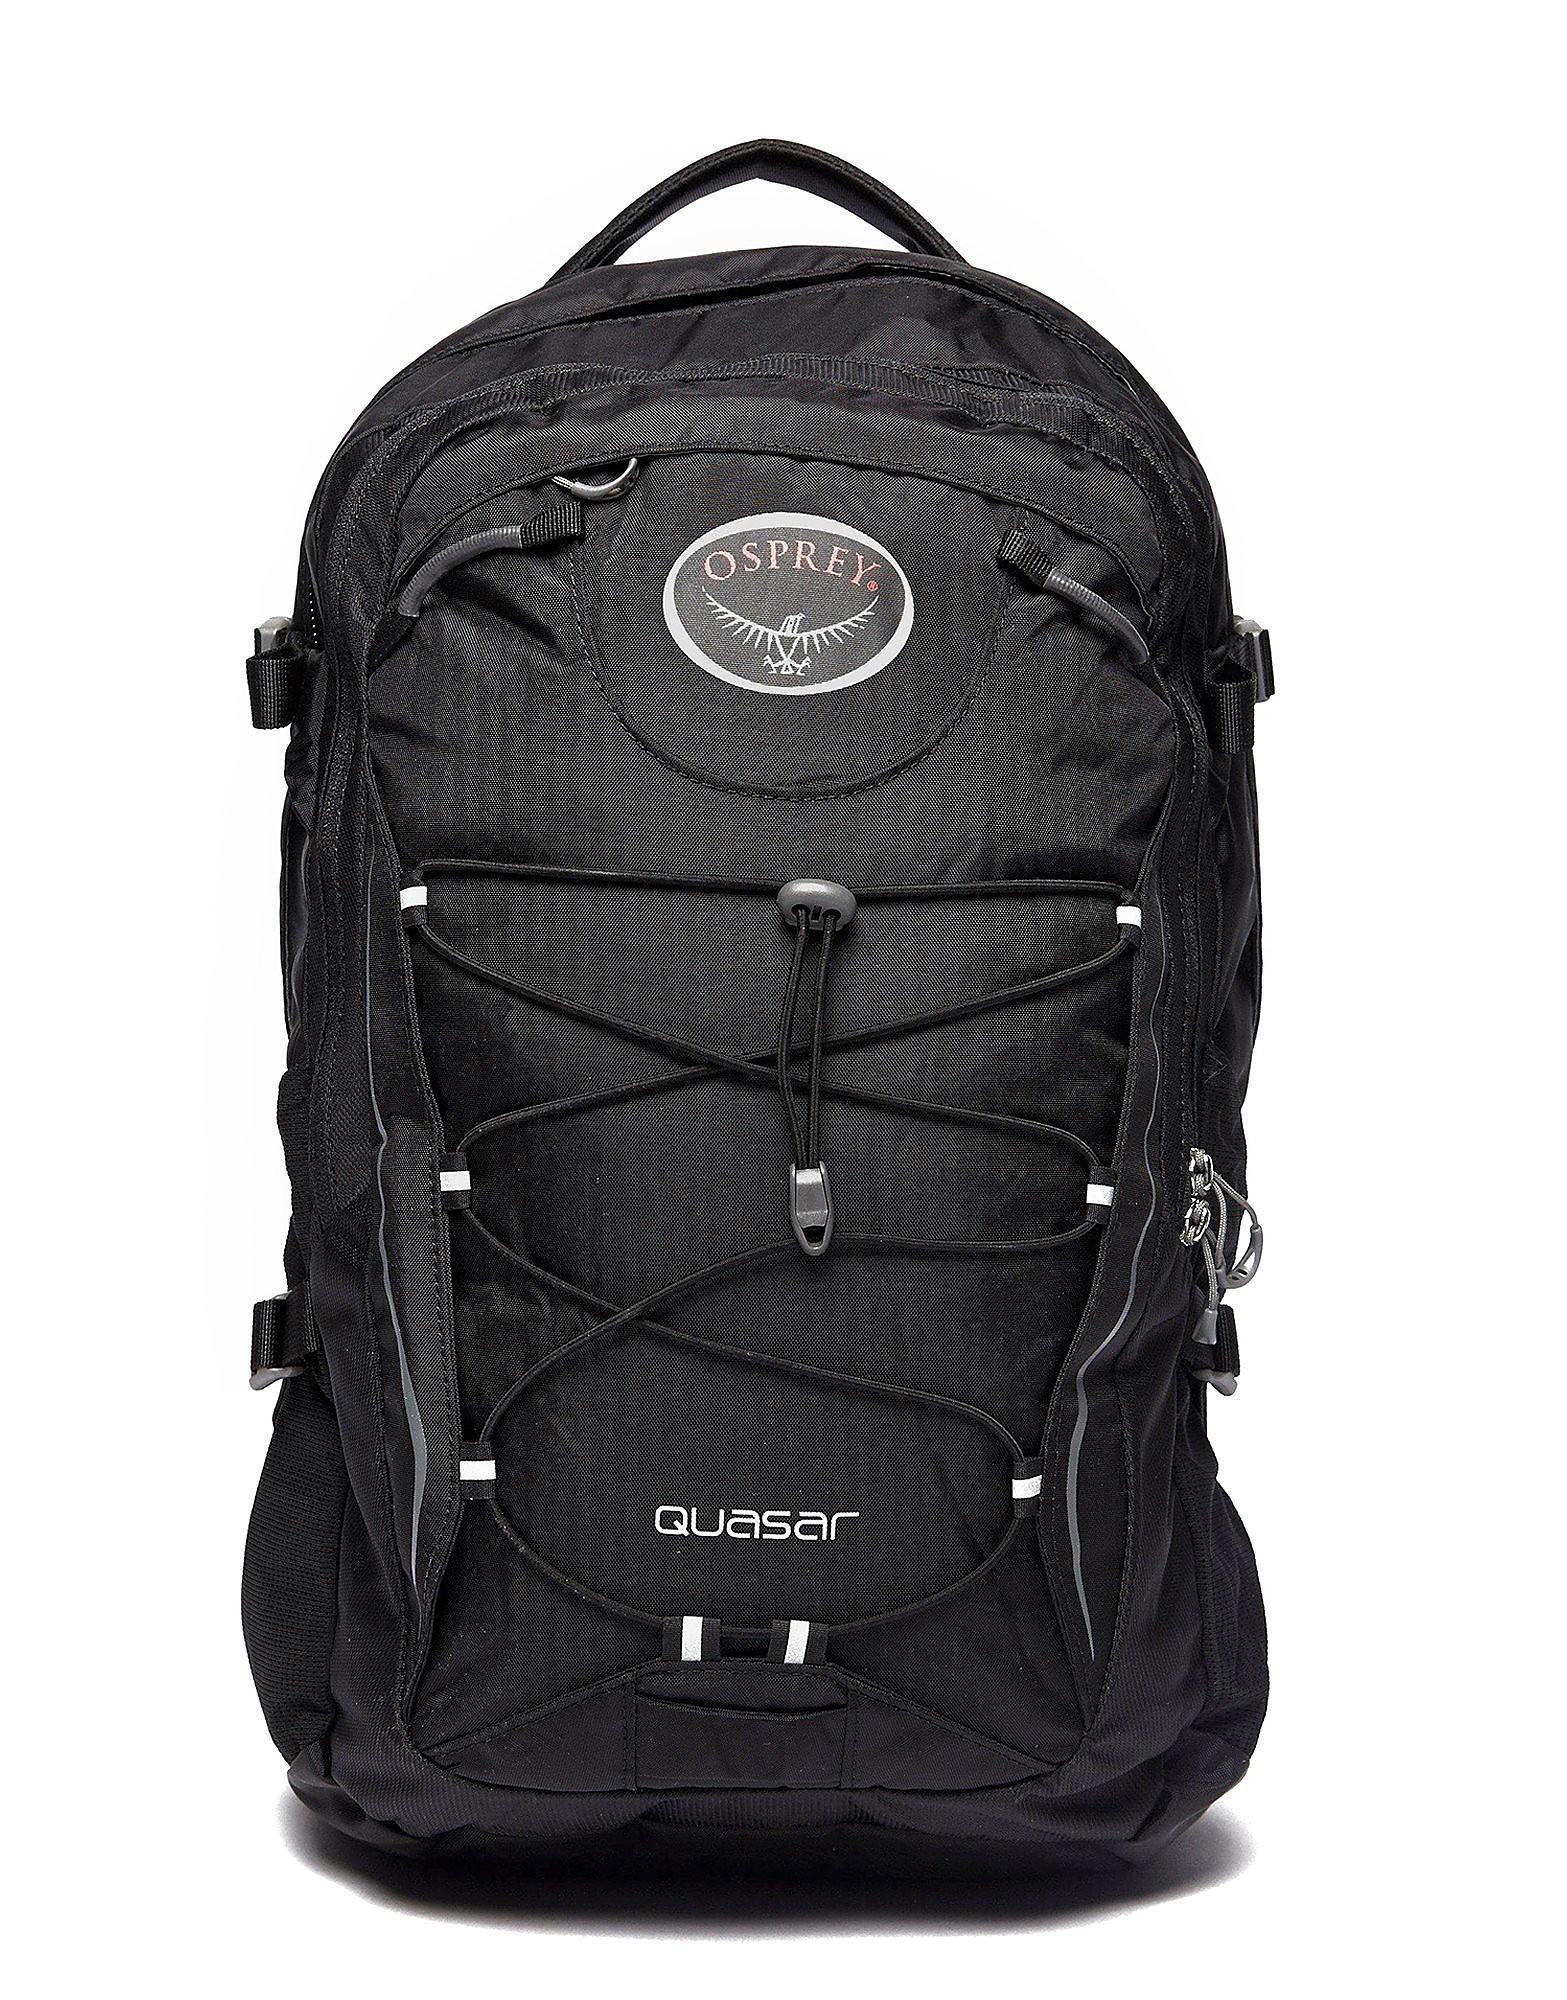 Osprey Quasar 28 Backpack